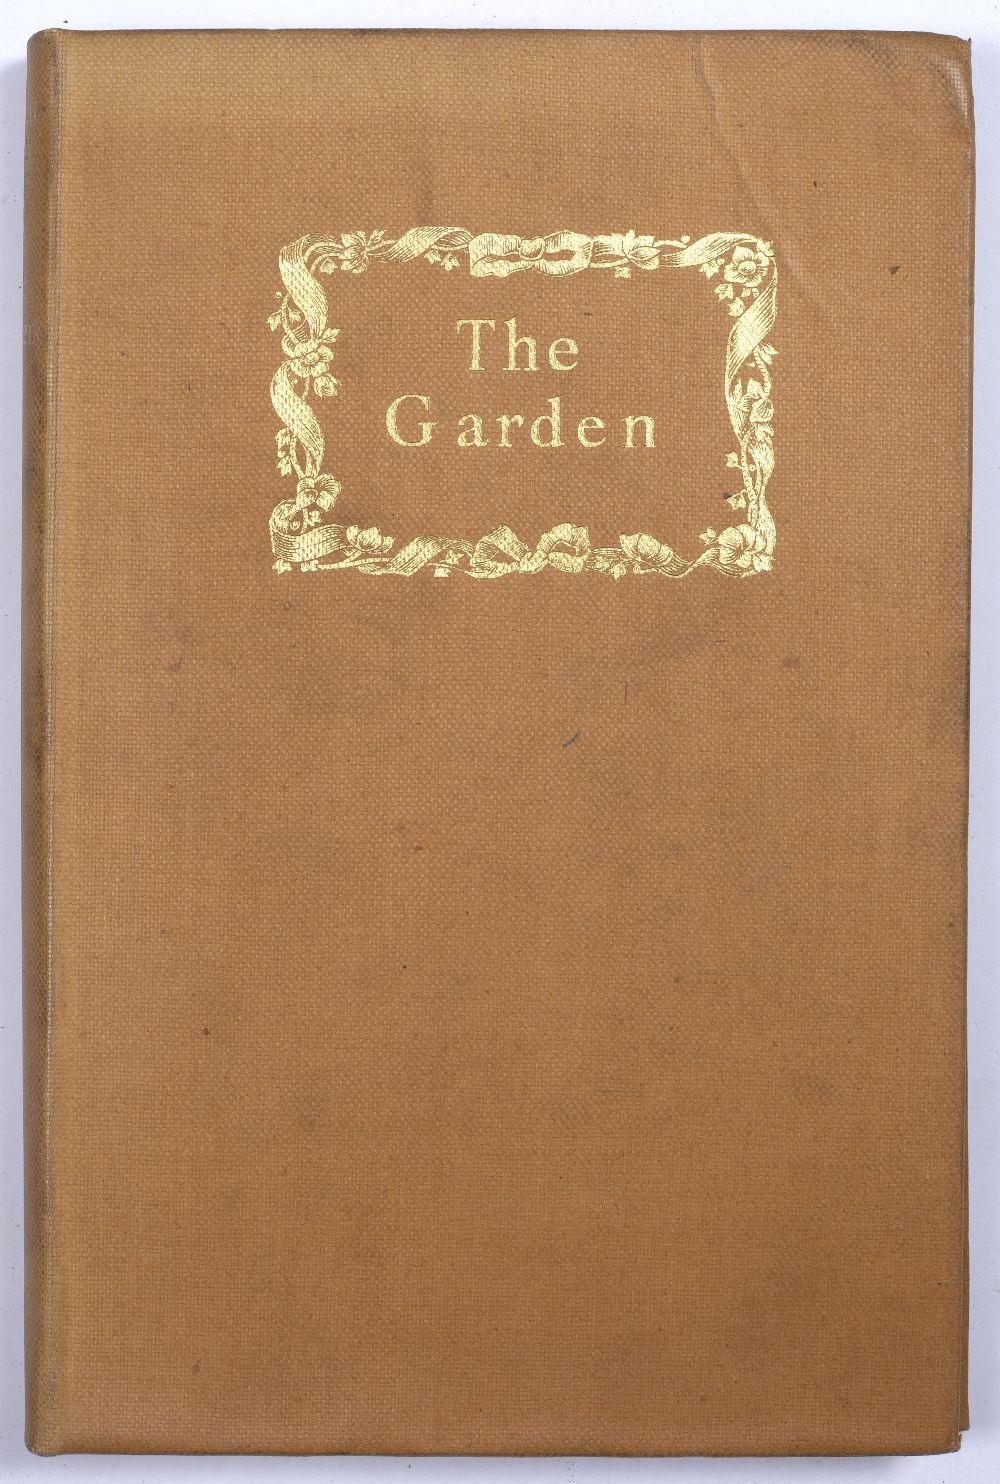 SACKVILLE-WEST, Vita, Lady Nicholson (1892-1962), English Poet, 'The Garden'. 5 seasonal poems